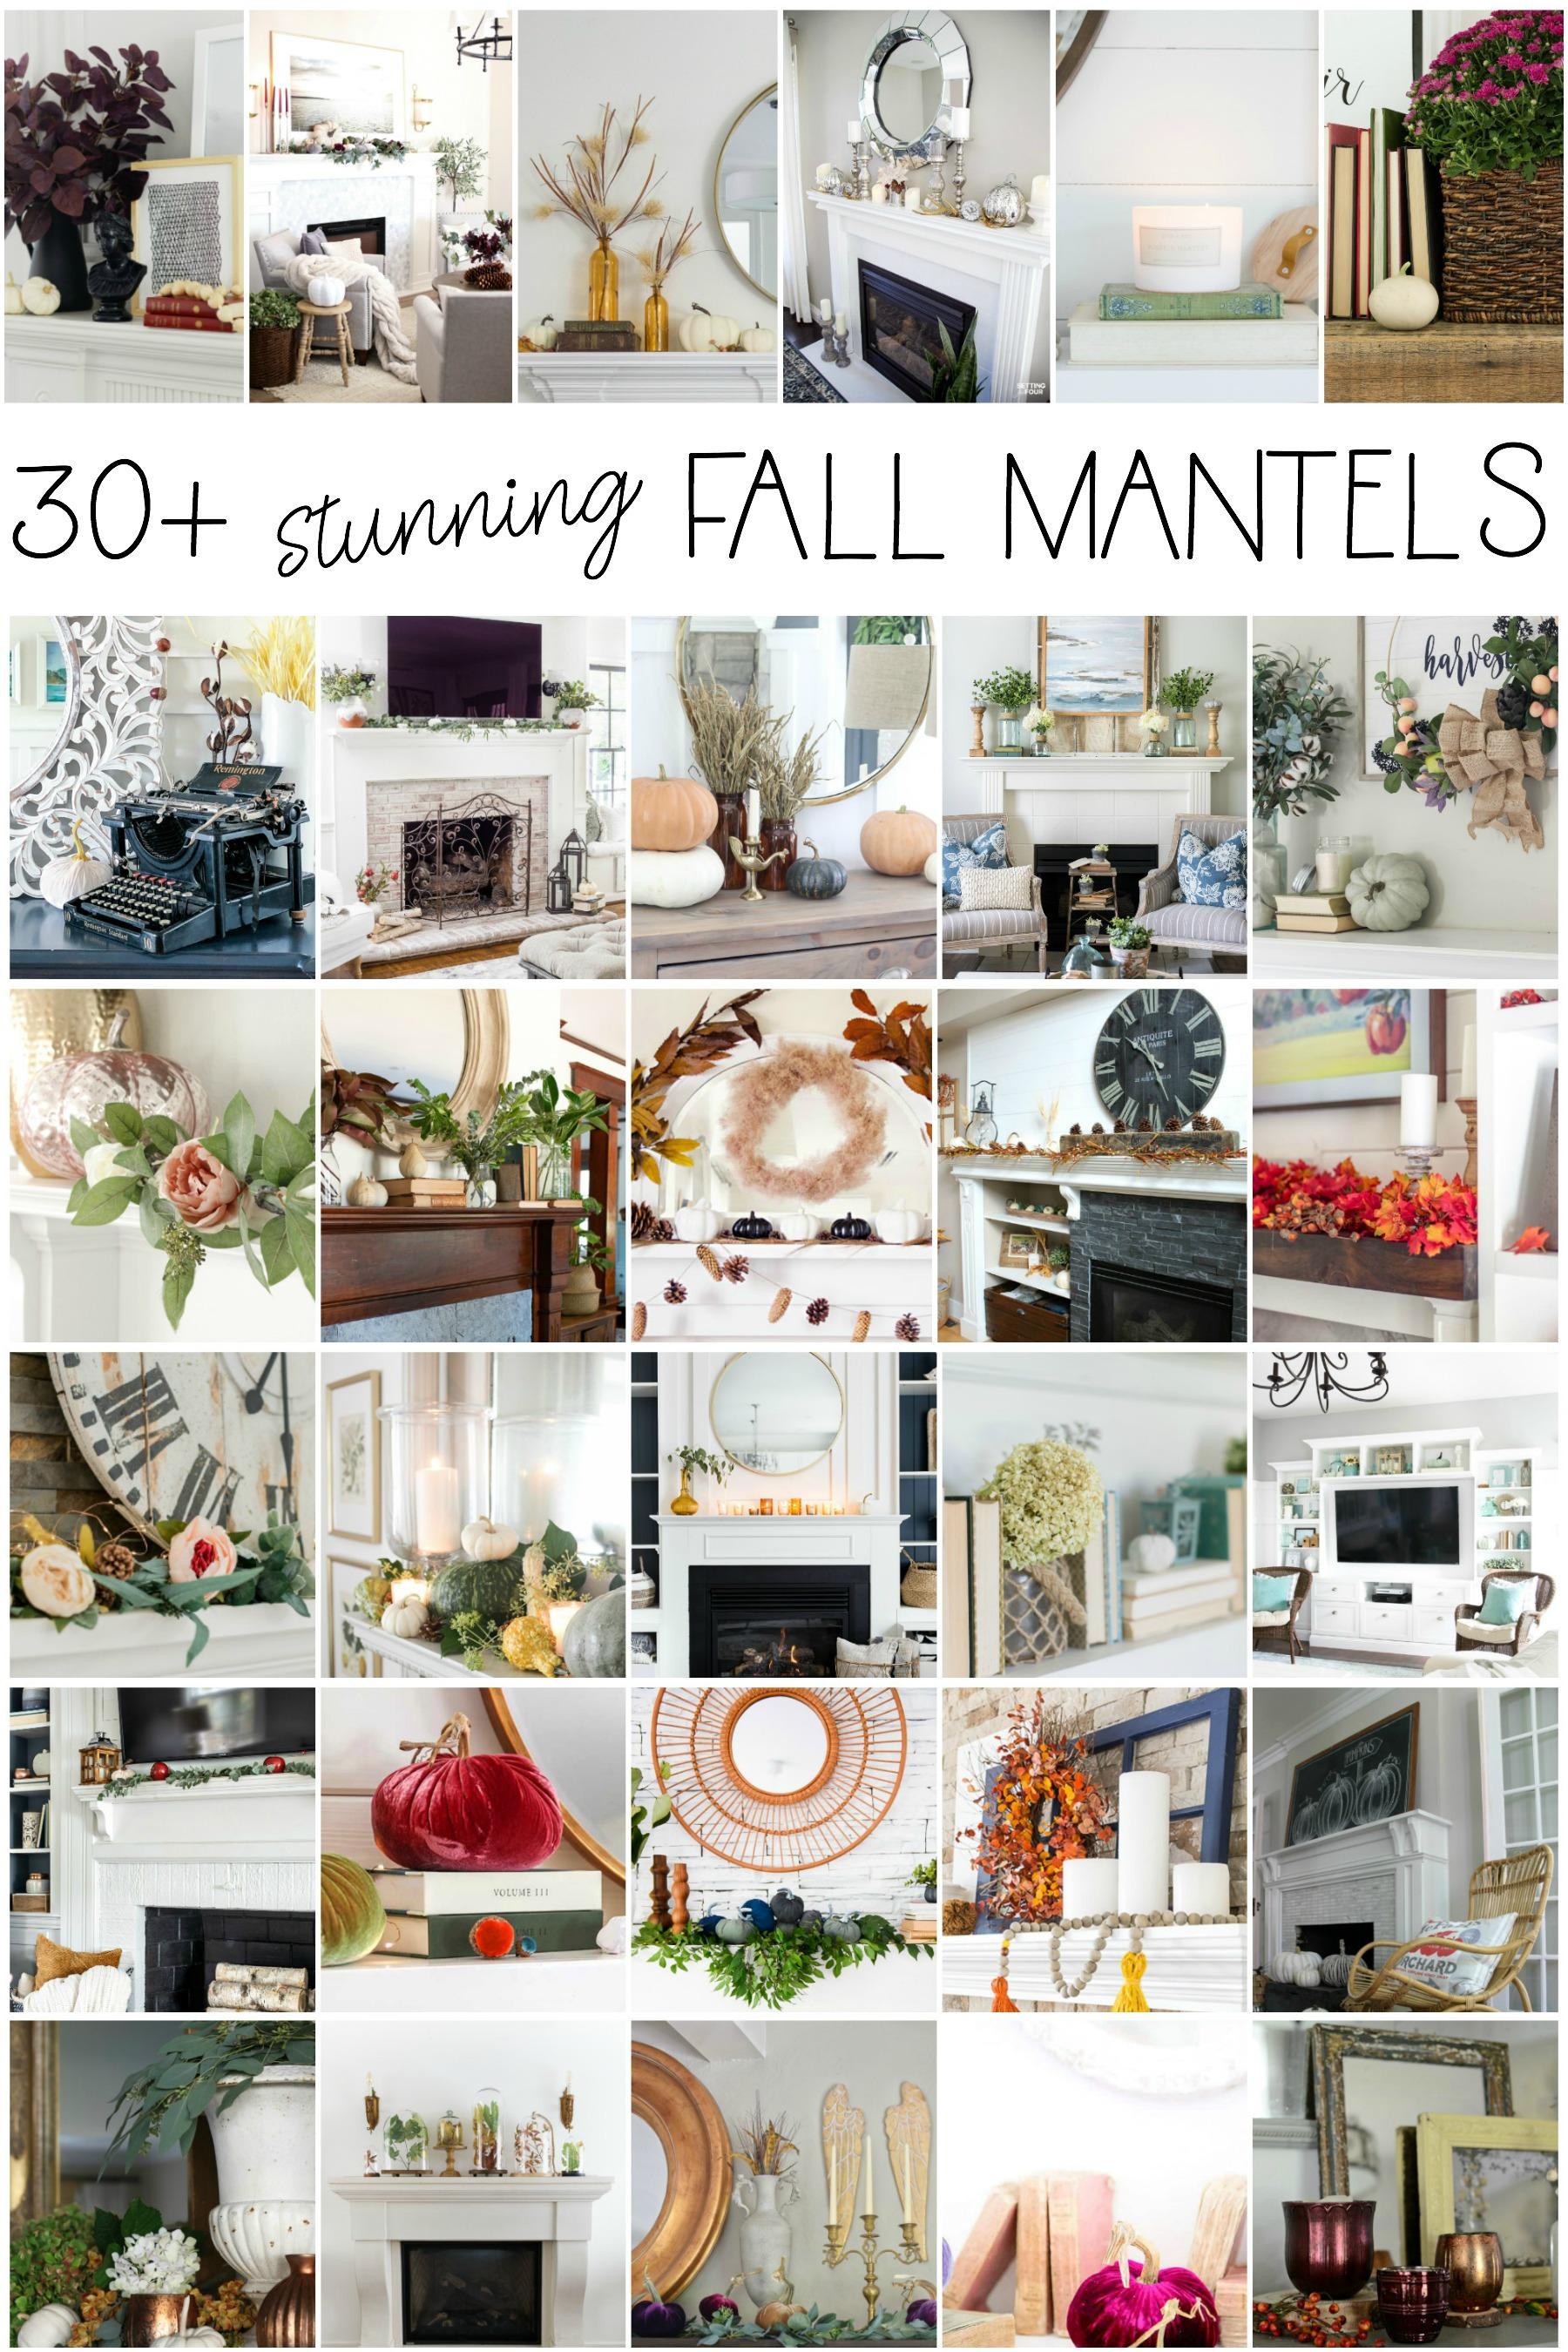 30 Stunning Fall Mantels kellyelko.com #fall #falldecor #mantels #fallmantels